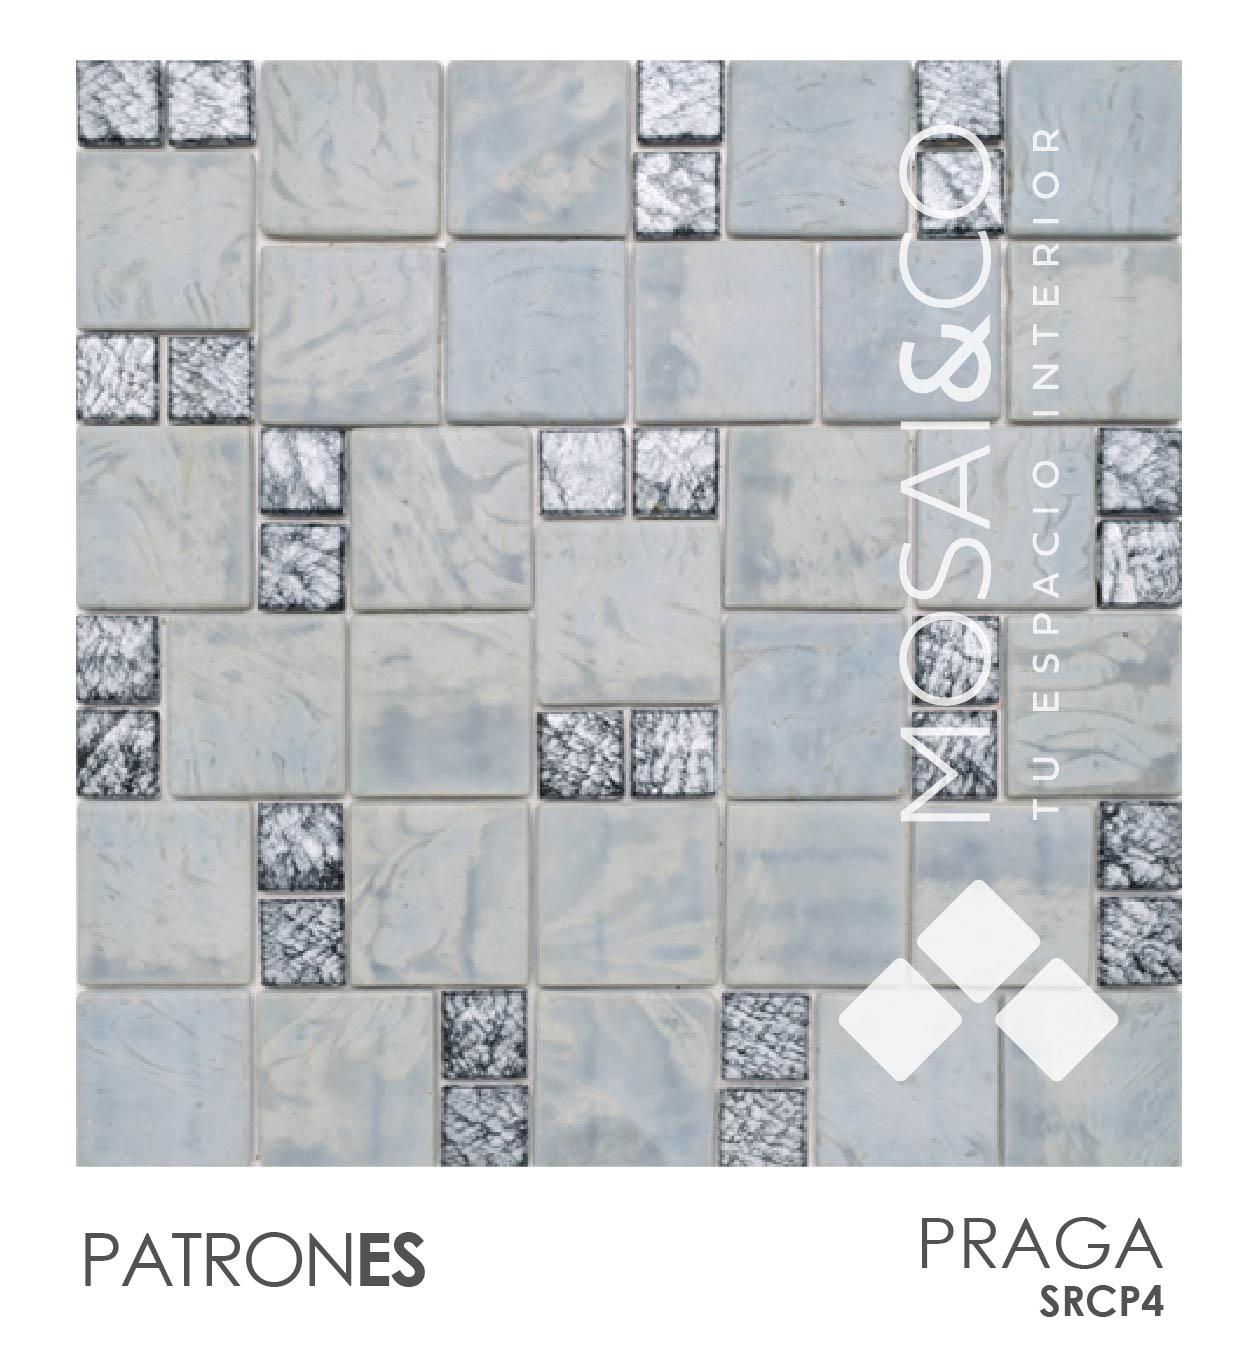 mosaico-linea-kristal-mosaiandco-patrones-praga